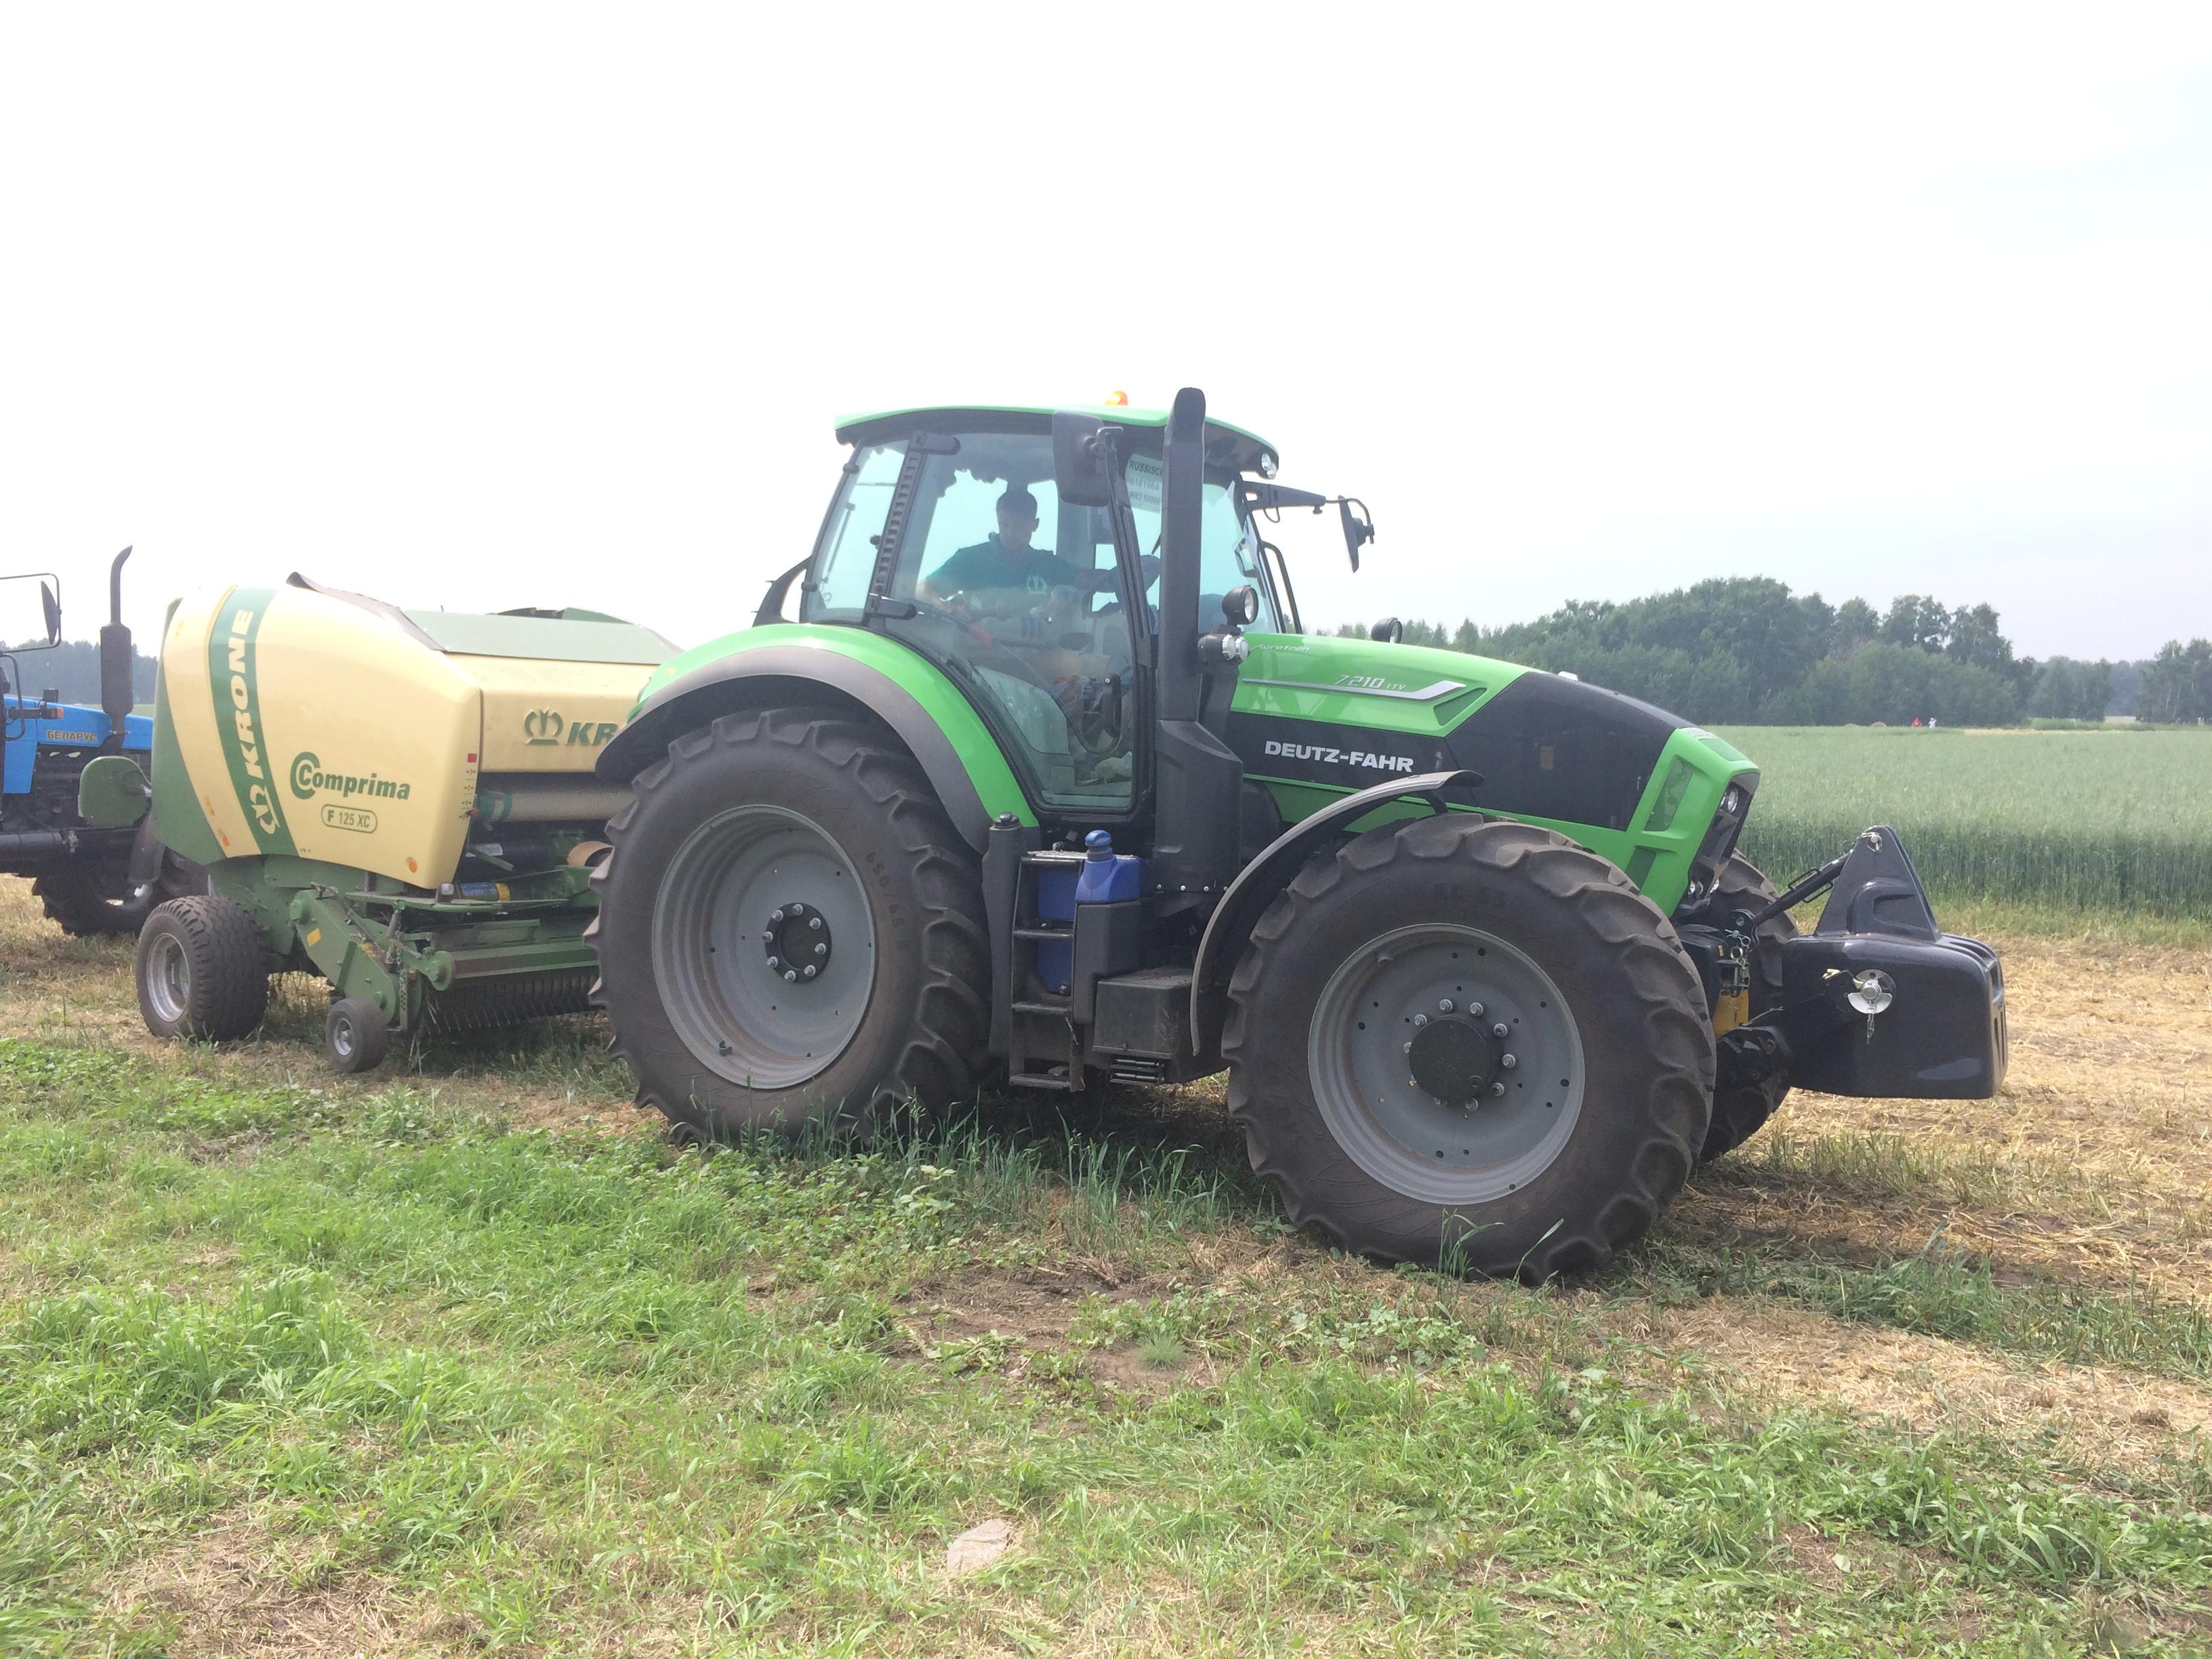 Рекорд России по тюкованию сена - Алтай 2016, комприма от Кроне и трактор Дойц Фар Agrotron 7210 TTV